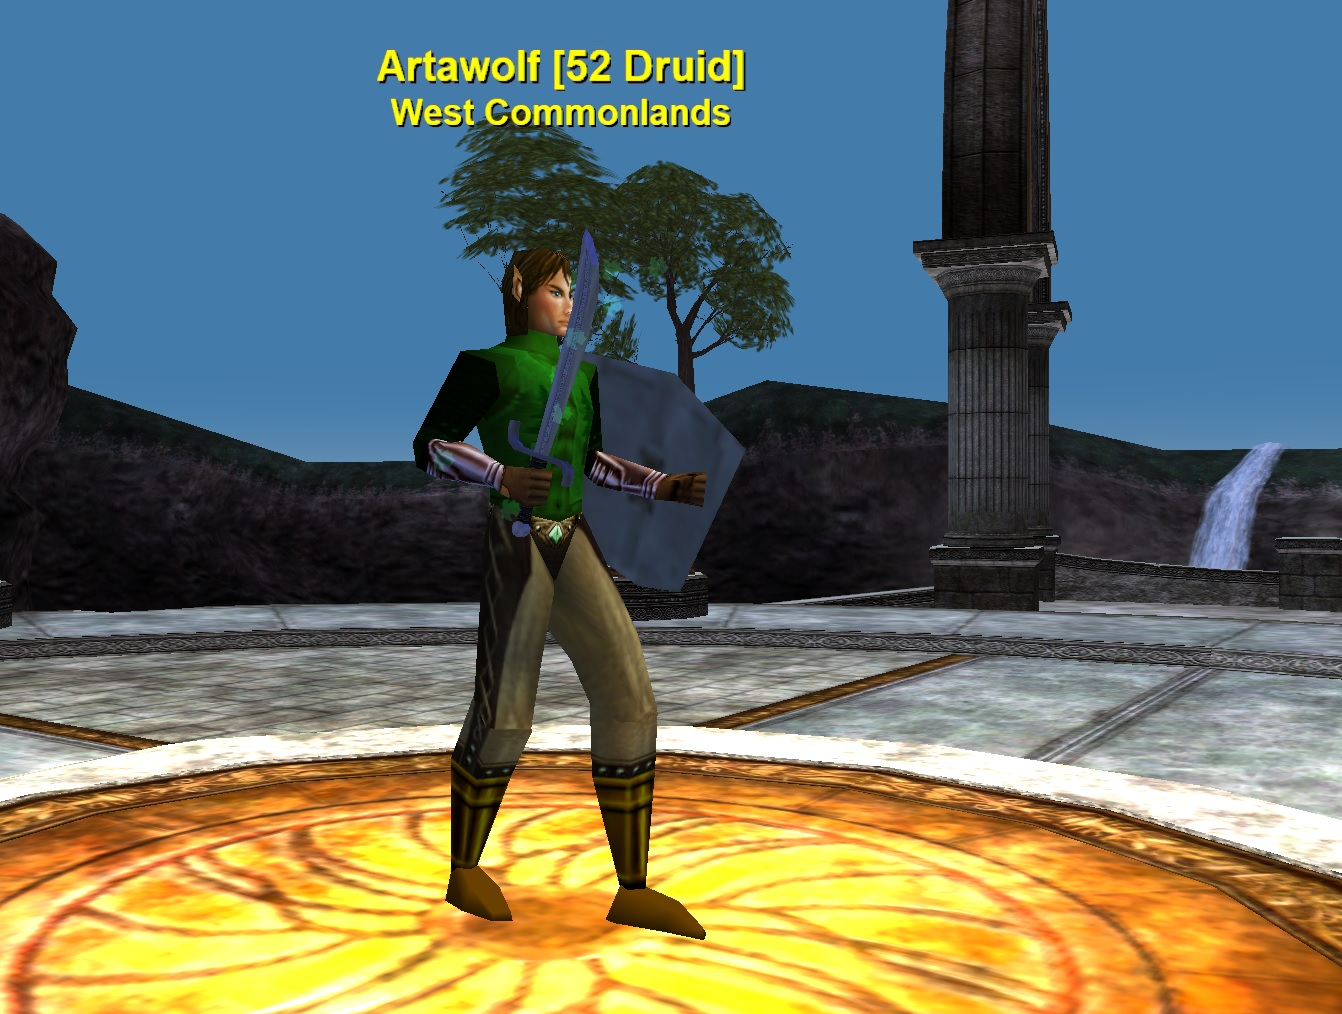 Artawolf Epic - Thank You Asgardians!